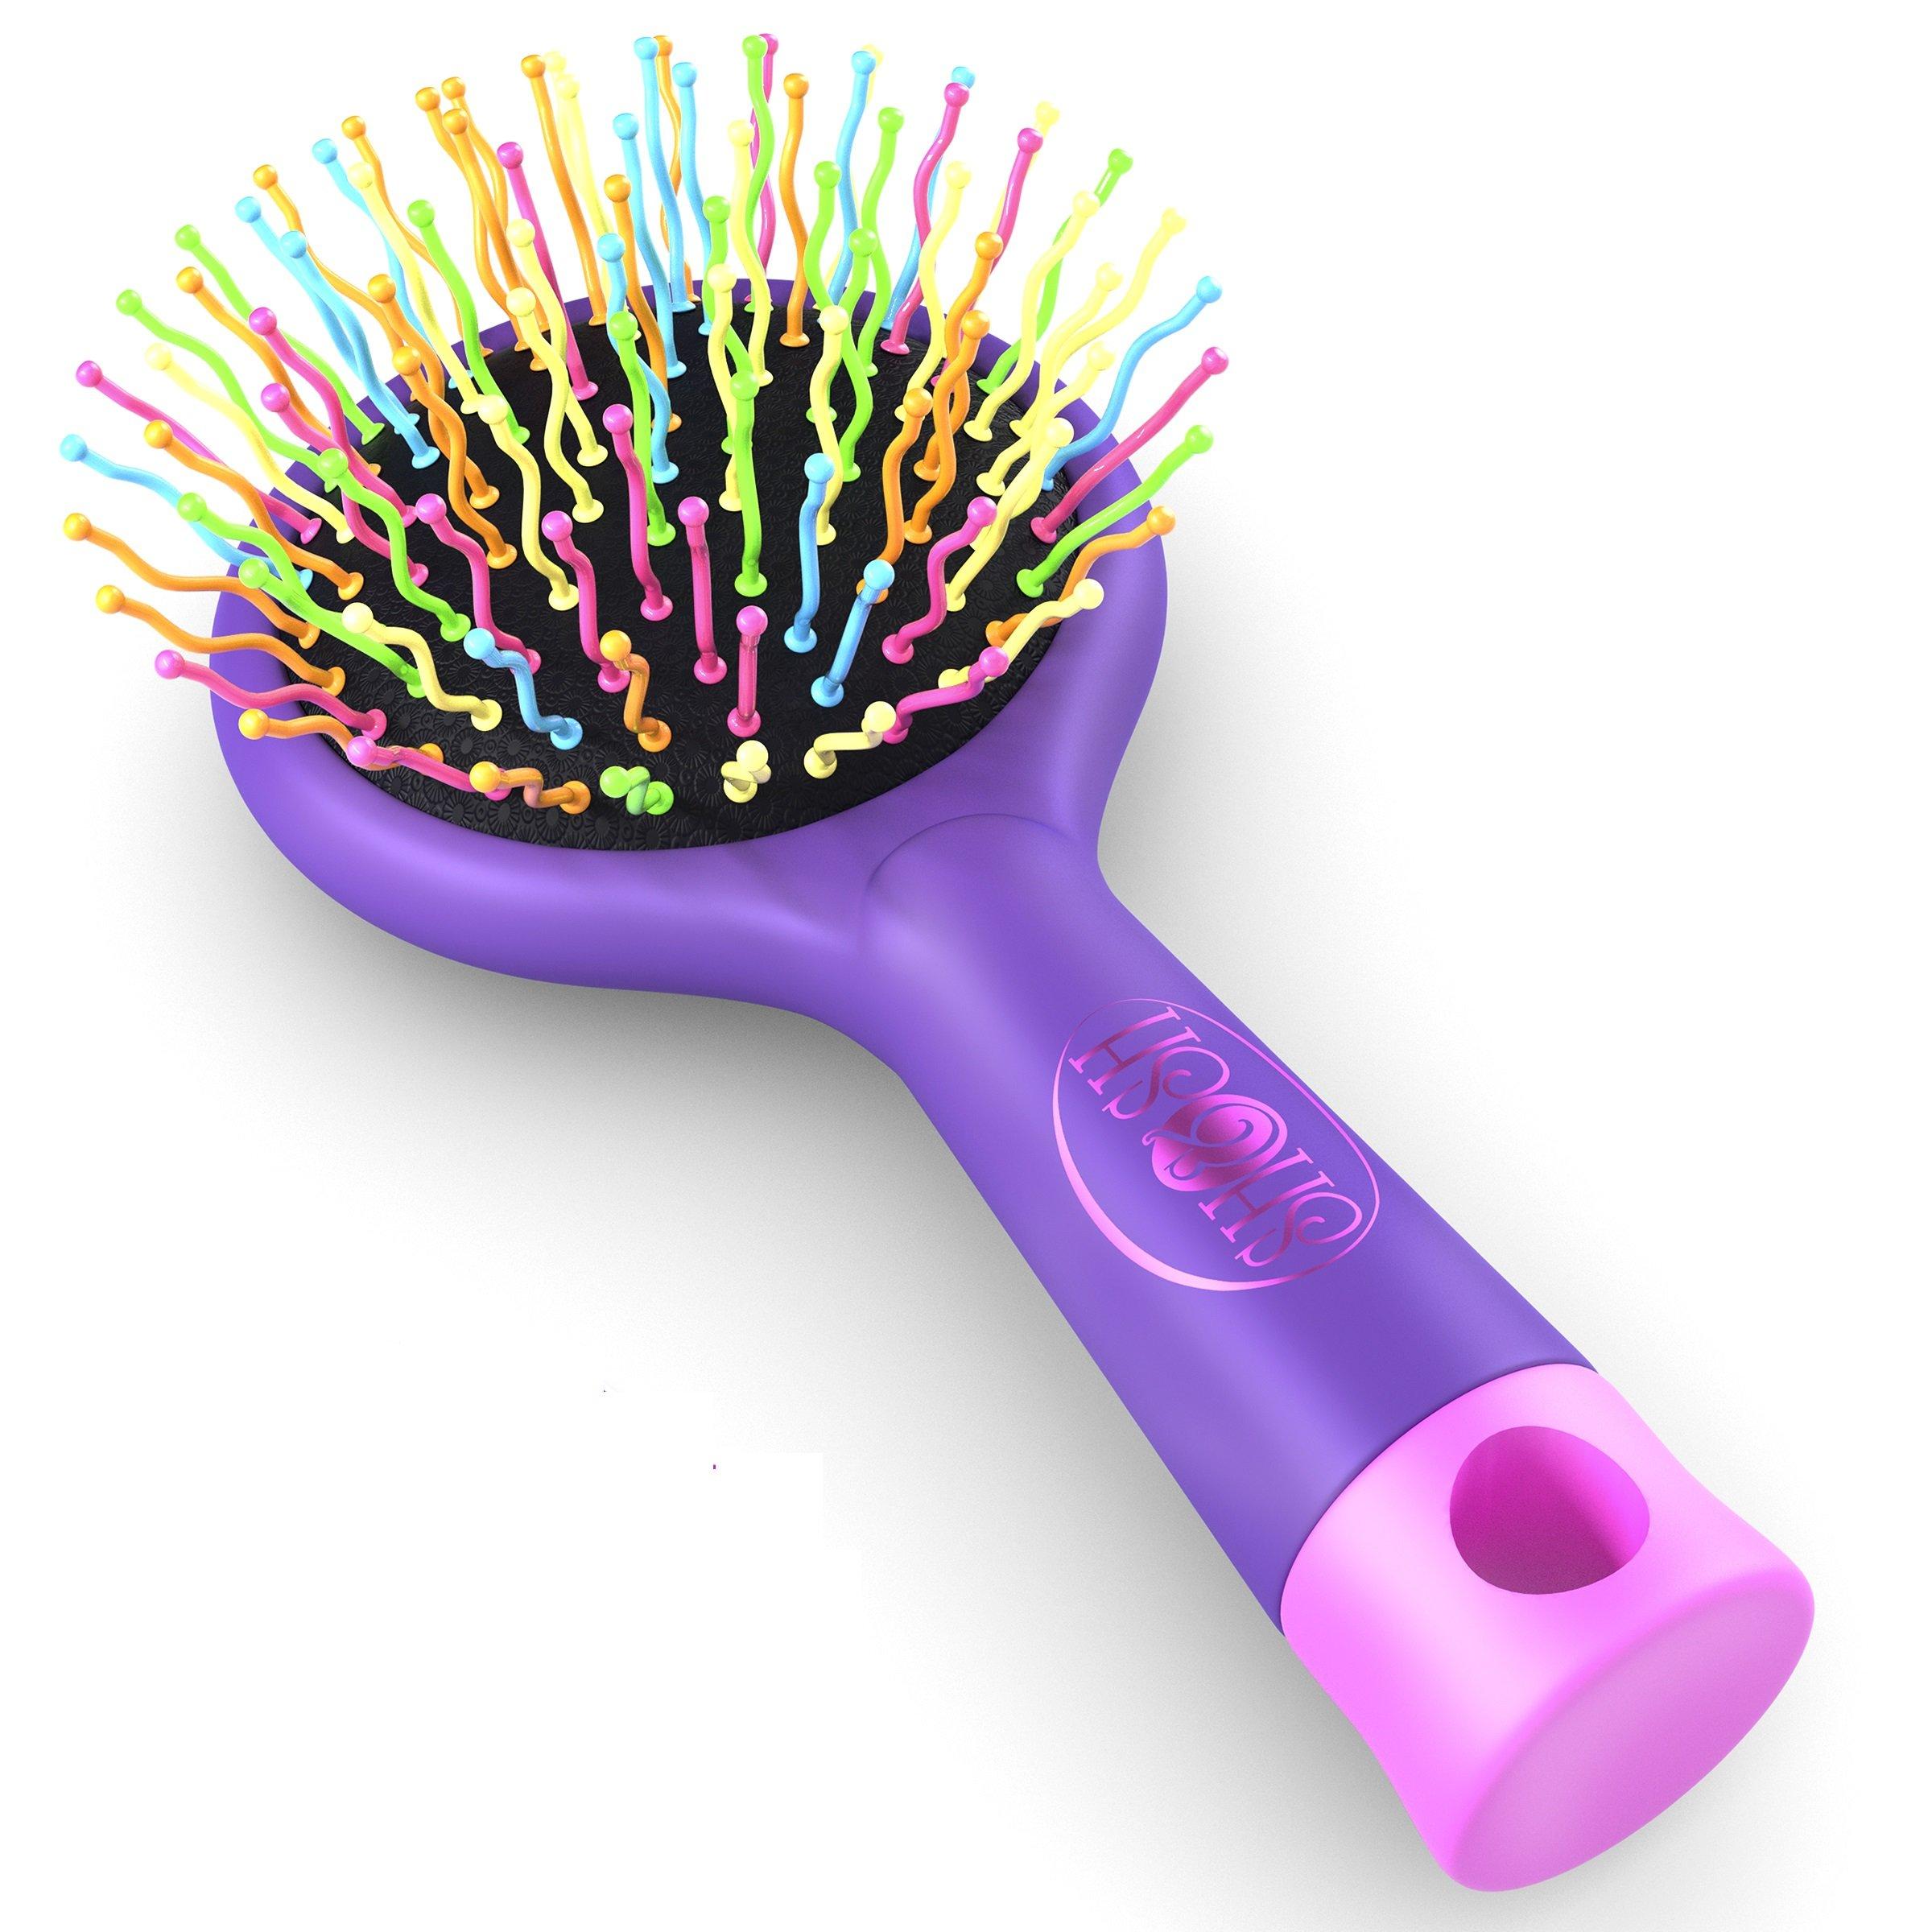 Detangling Brush with a Mirror - Soft Bristle- Straightening Detangler- For All Hair Types (Purple)